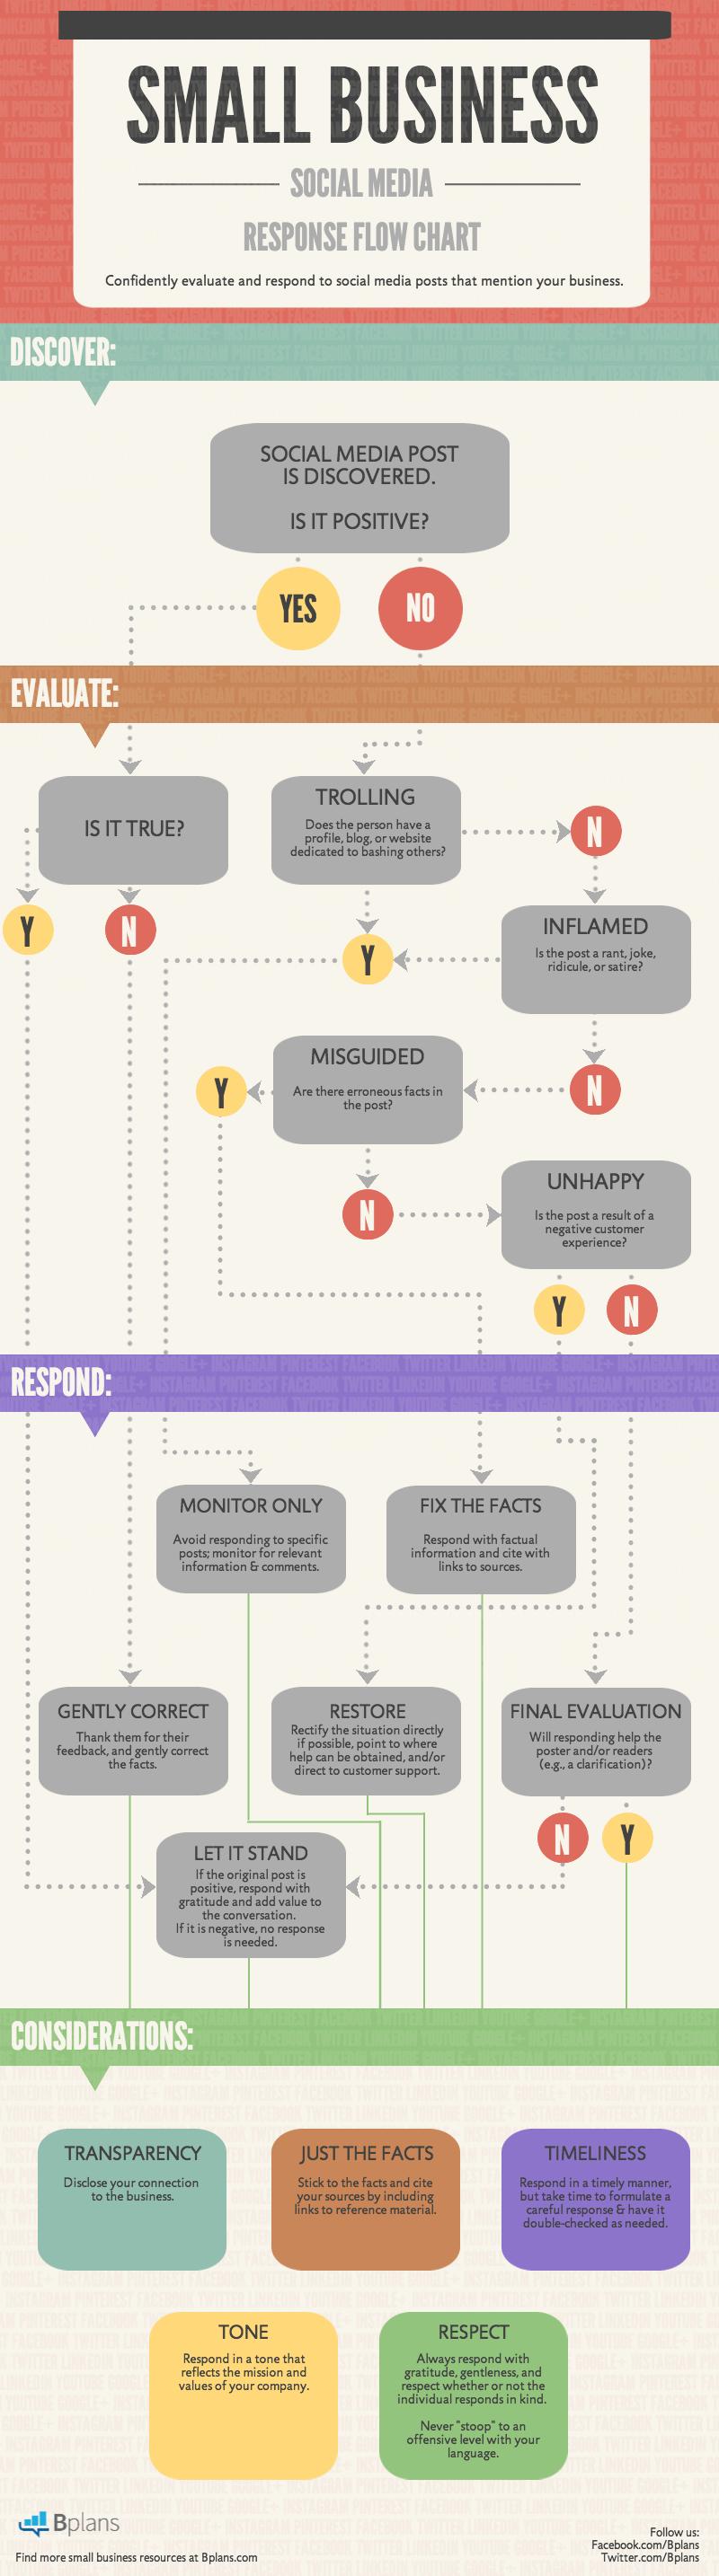 Social media response flow chart